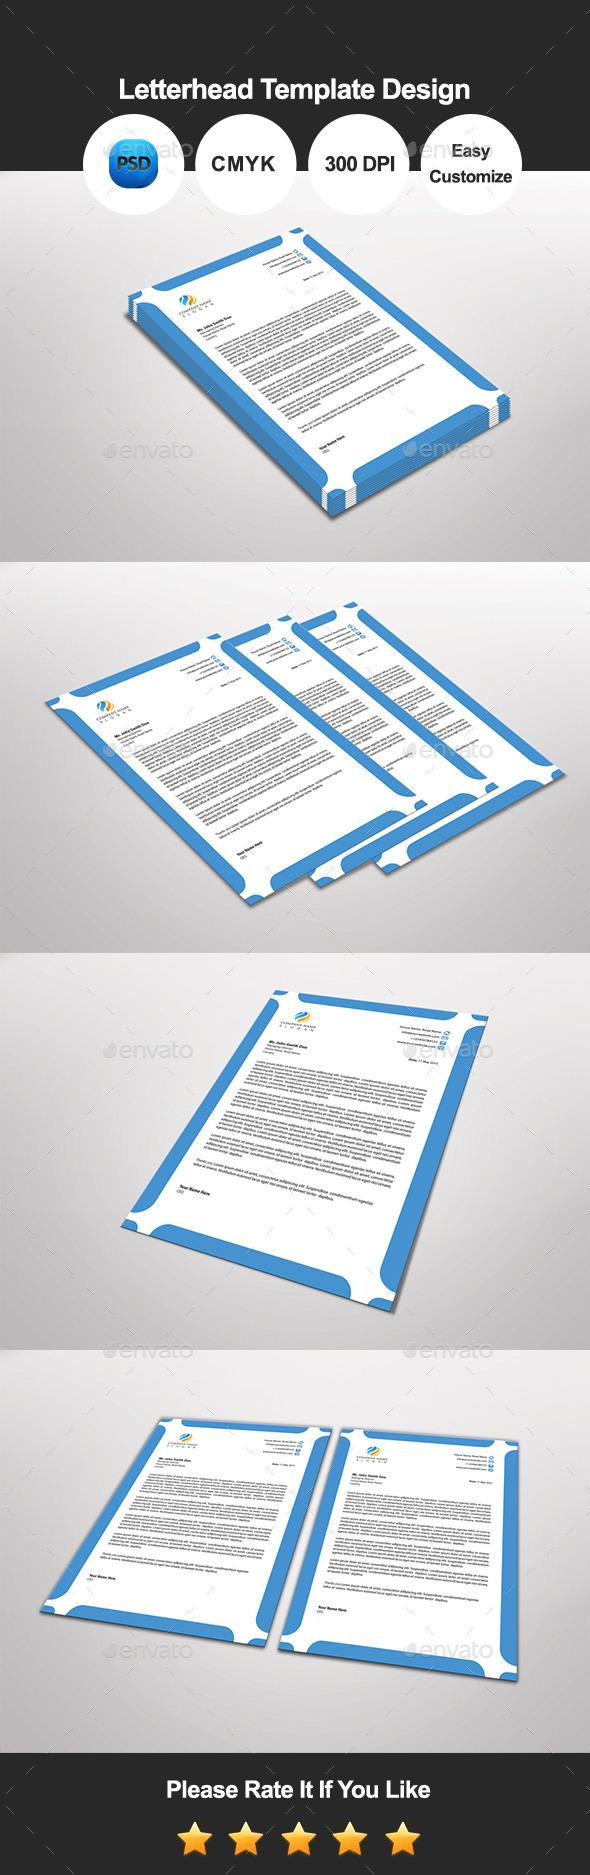 Jinjil Letterhead Template Design - Proposals & Invoices Stationery